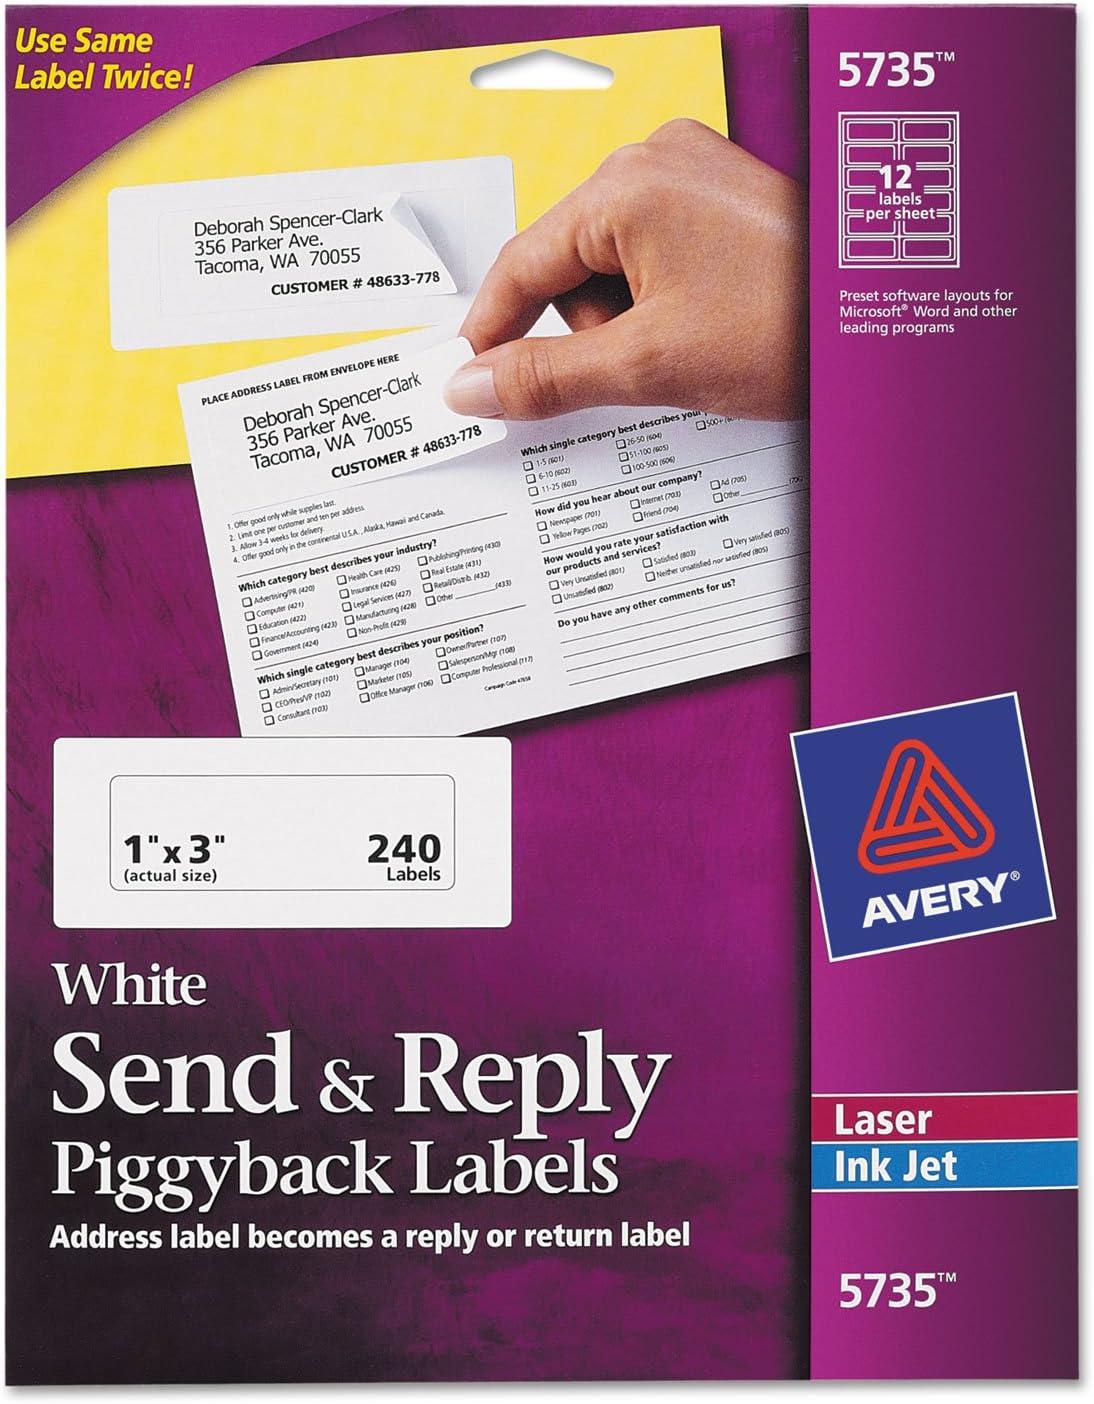 Avery 5735 Send & Reply Piggyback Inkjet/Laser Printer Labels, 1 5/8 x 4, White, 240/Pack